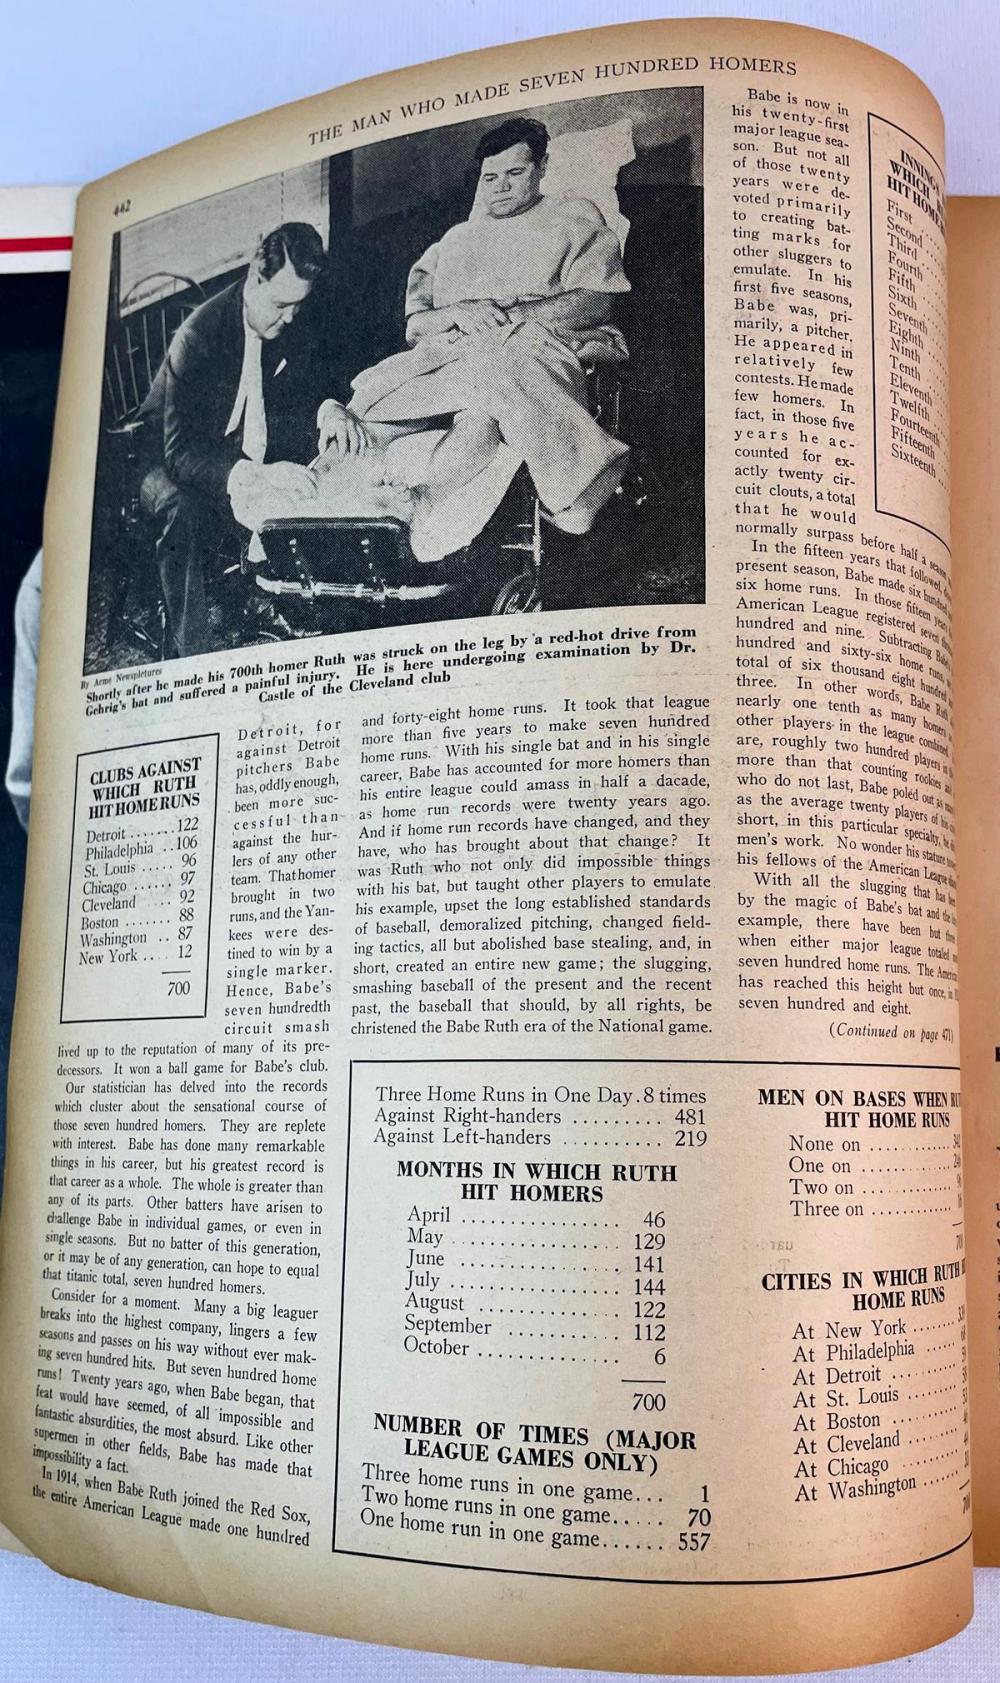 September 1934 Baseball Magazine (The Man Who Made 700 Home Runs, Babe Ruth Article)